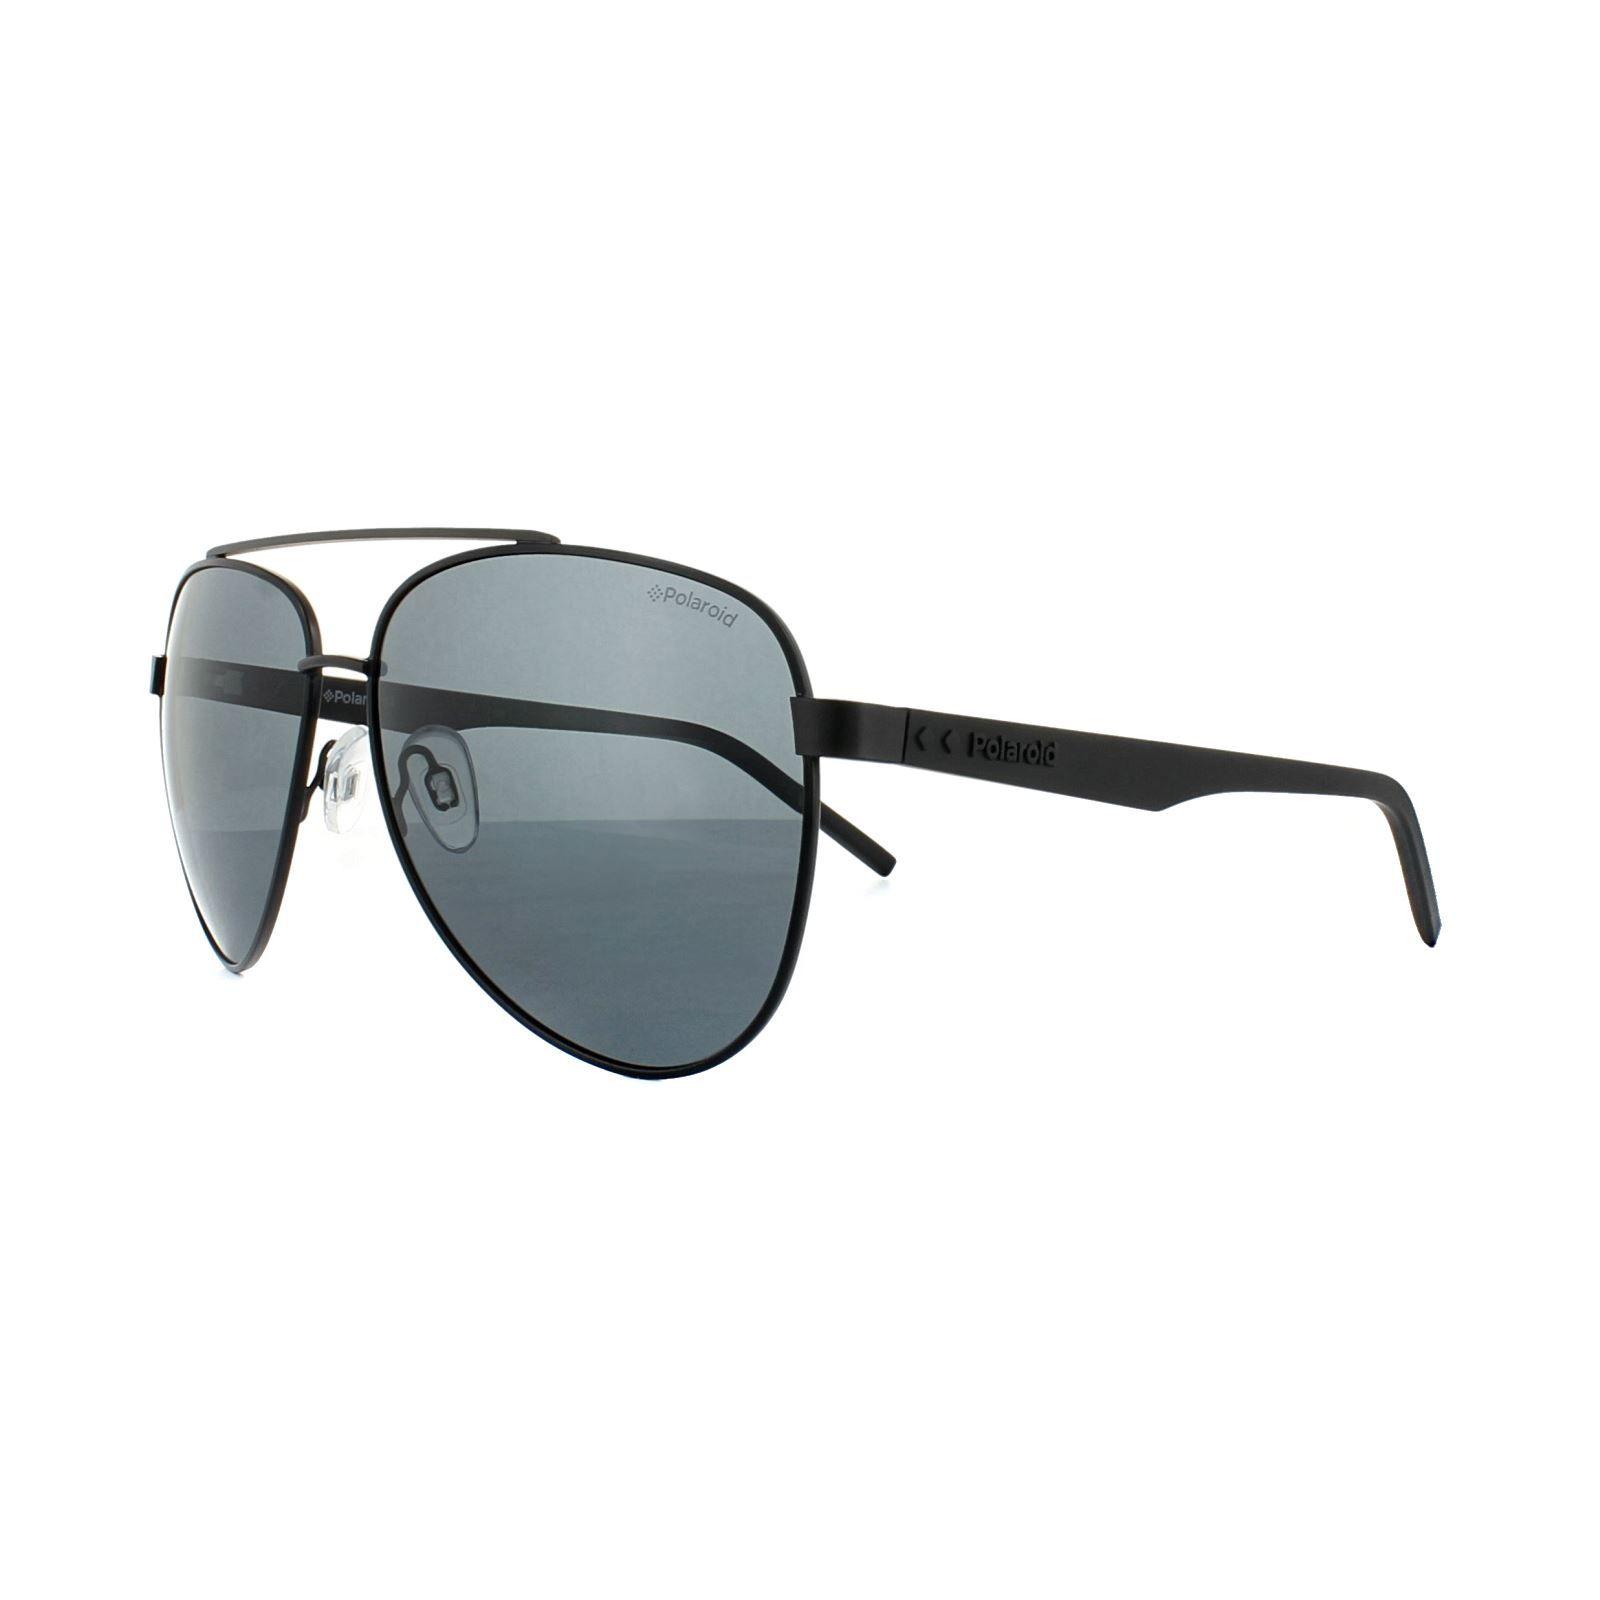 Polaroid Sunglasses PLD 2043/S 807 M9 Black Grey Polarized